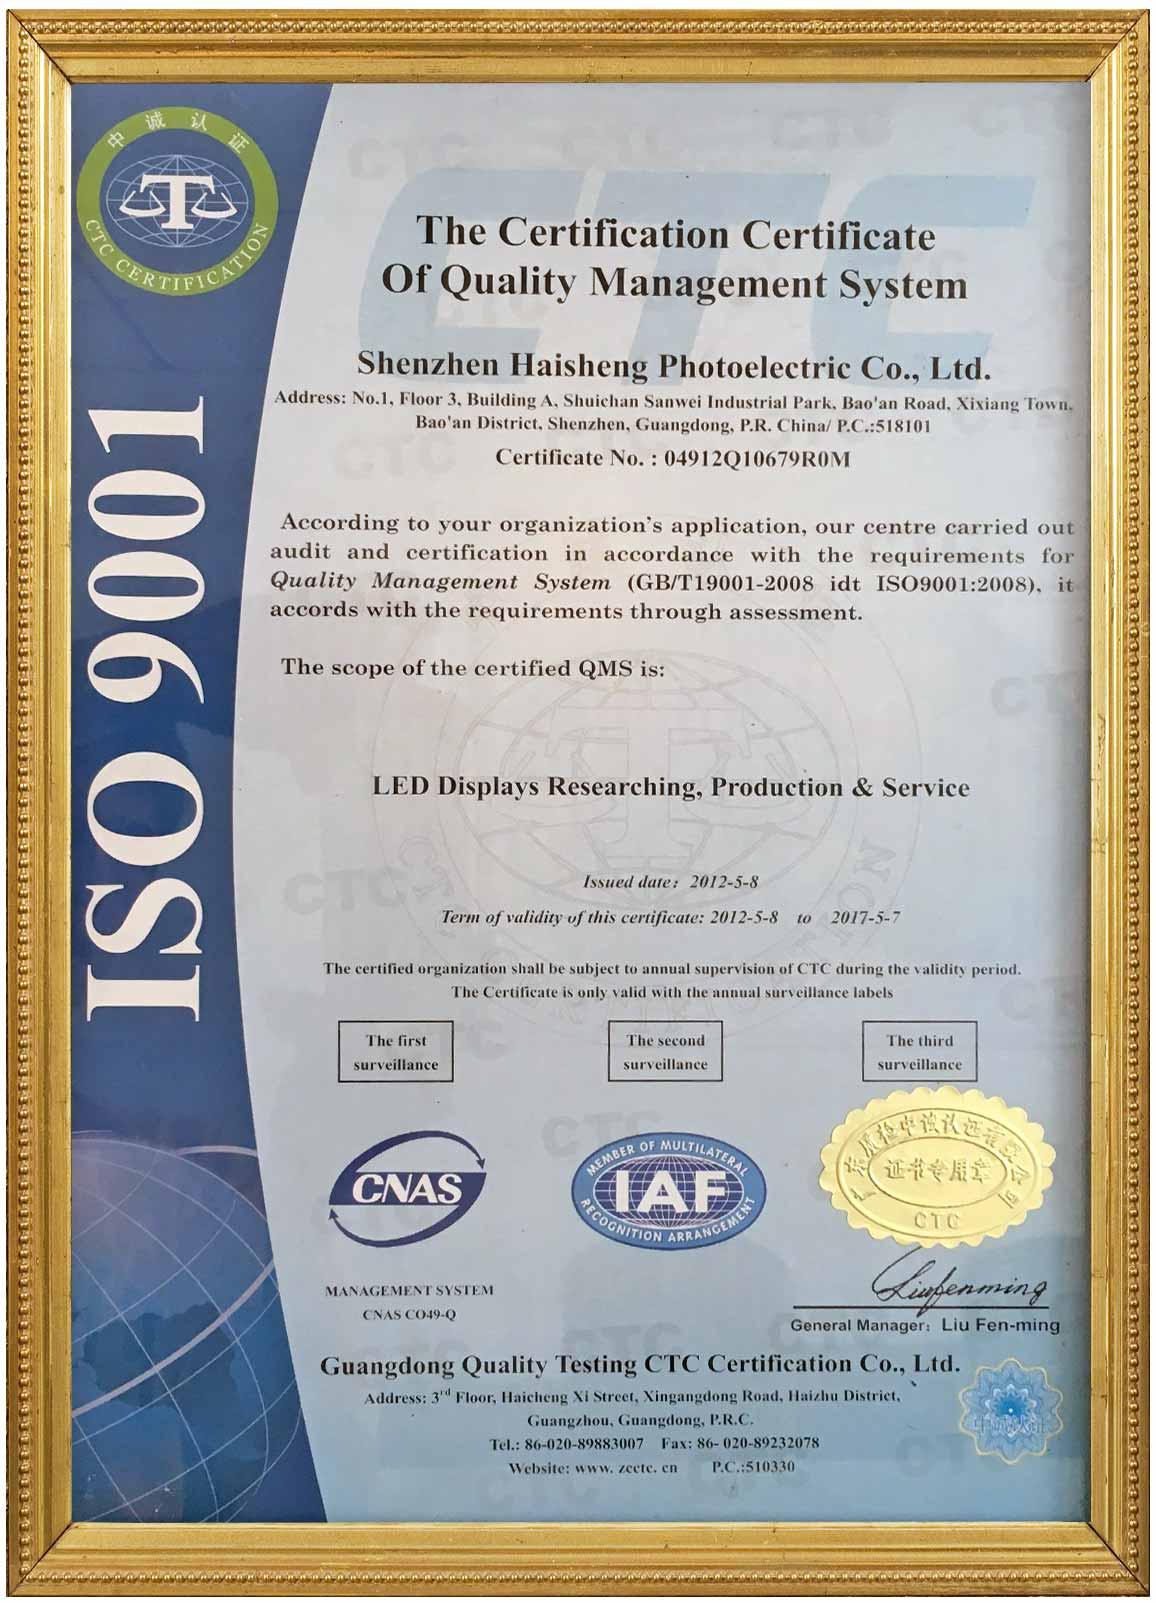 Led displays certificate of optokingdom thumb 1 1betcityfo Choice Image